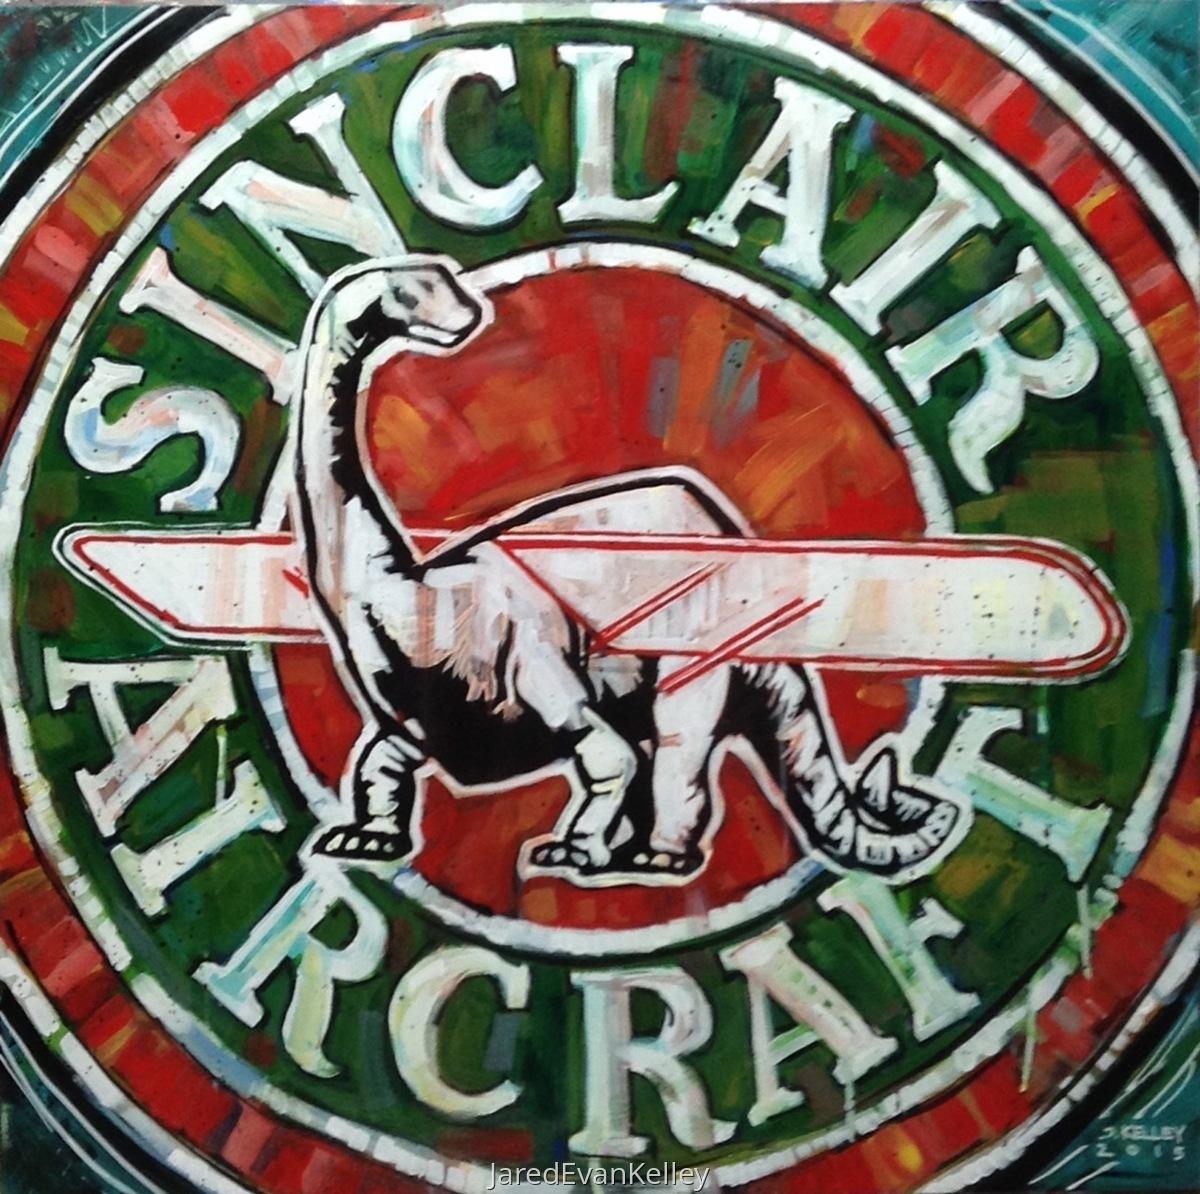 Sinclair (large view)